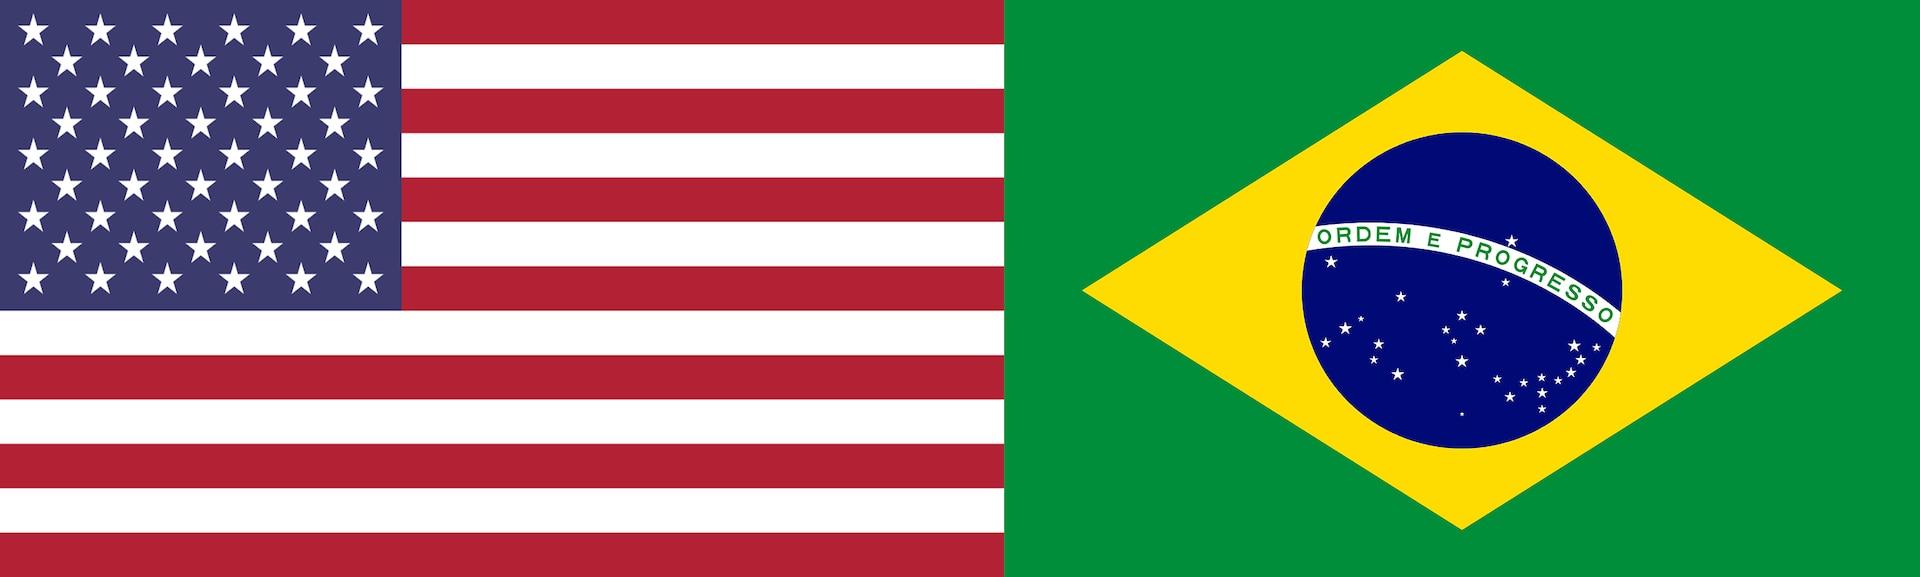 U.S.-Brazil Space Sharing Agreement